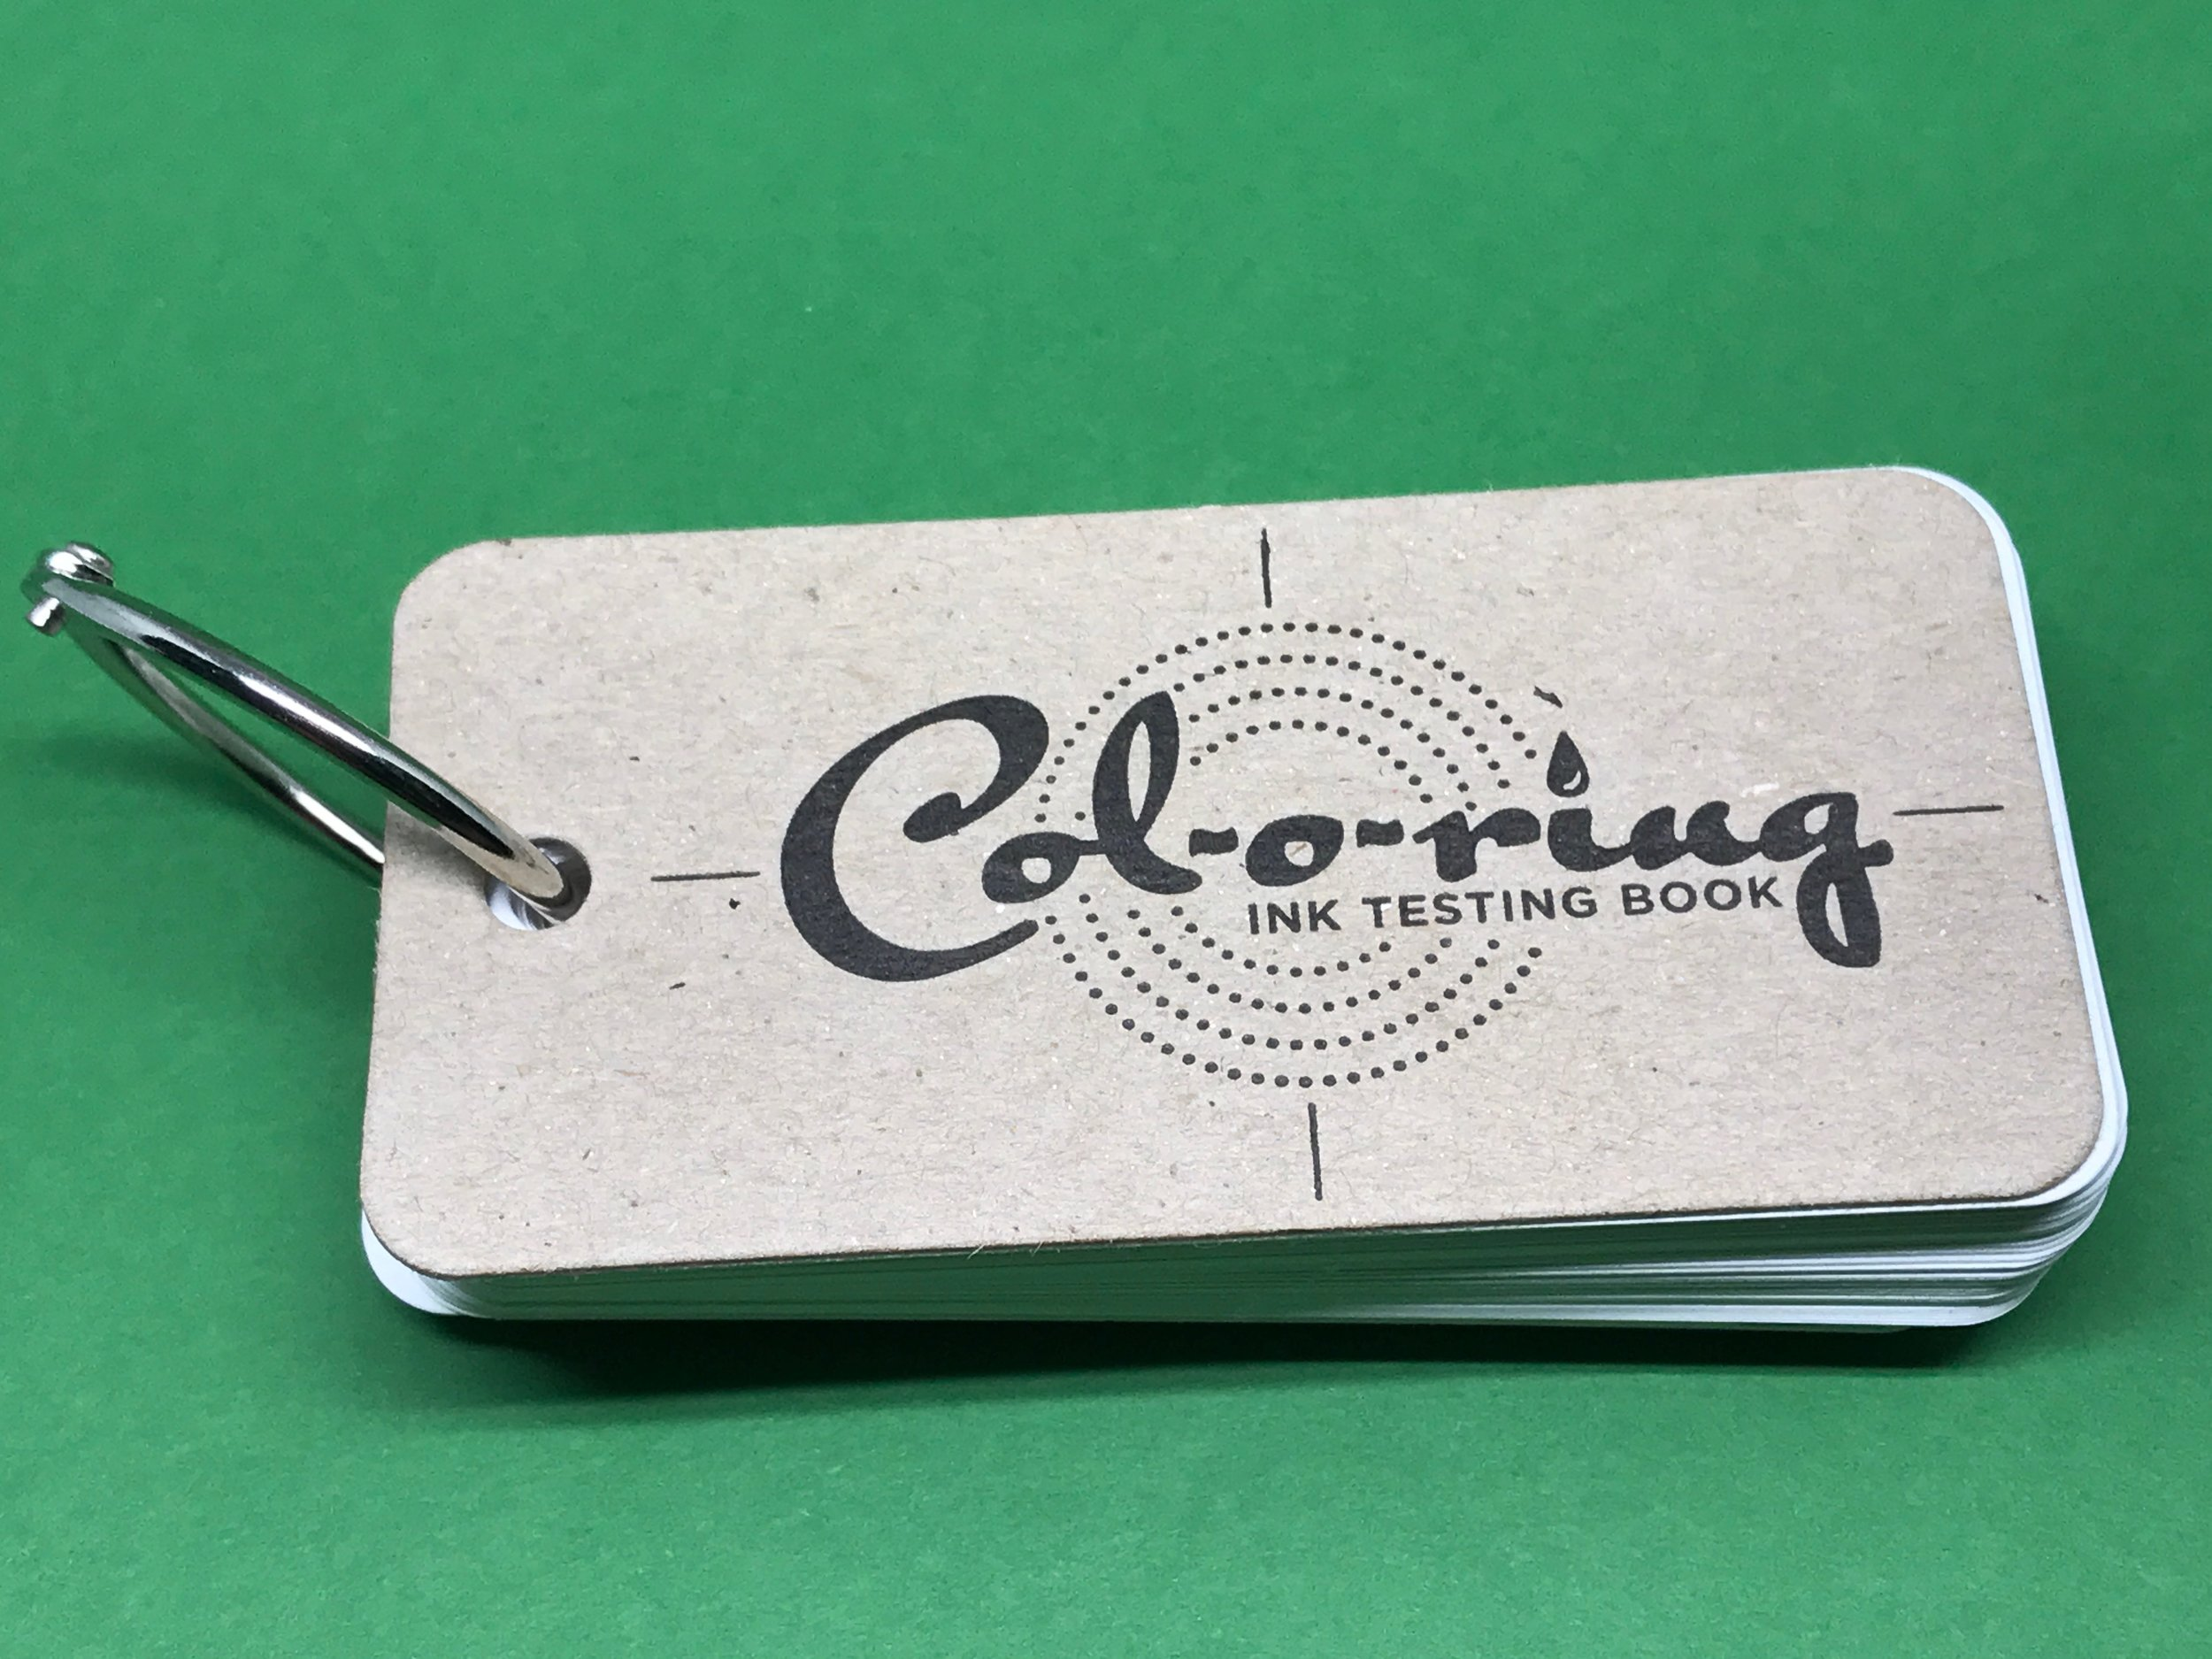 col-o-ring-ink-testing-book-1.jpg